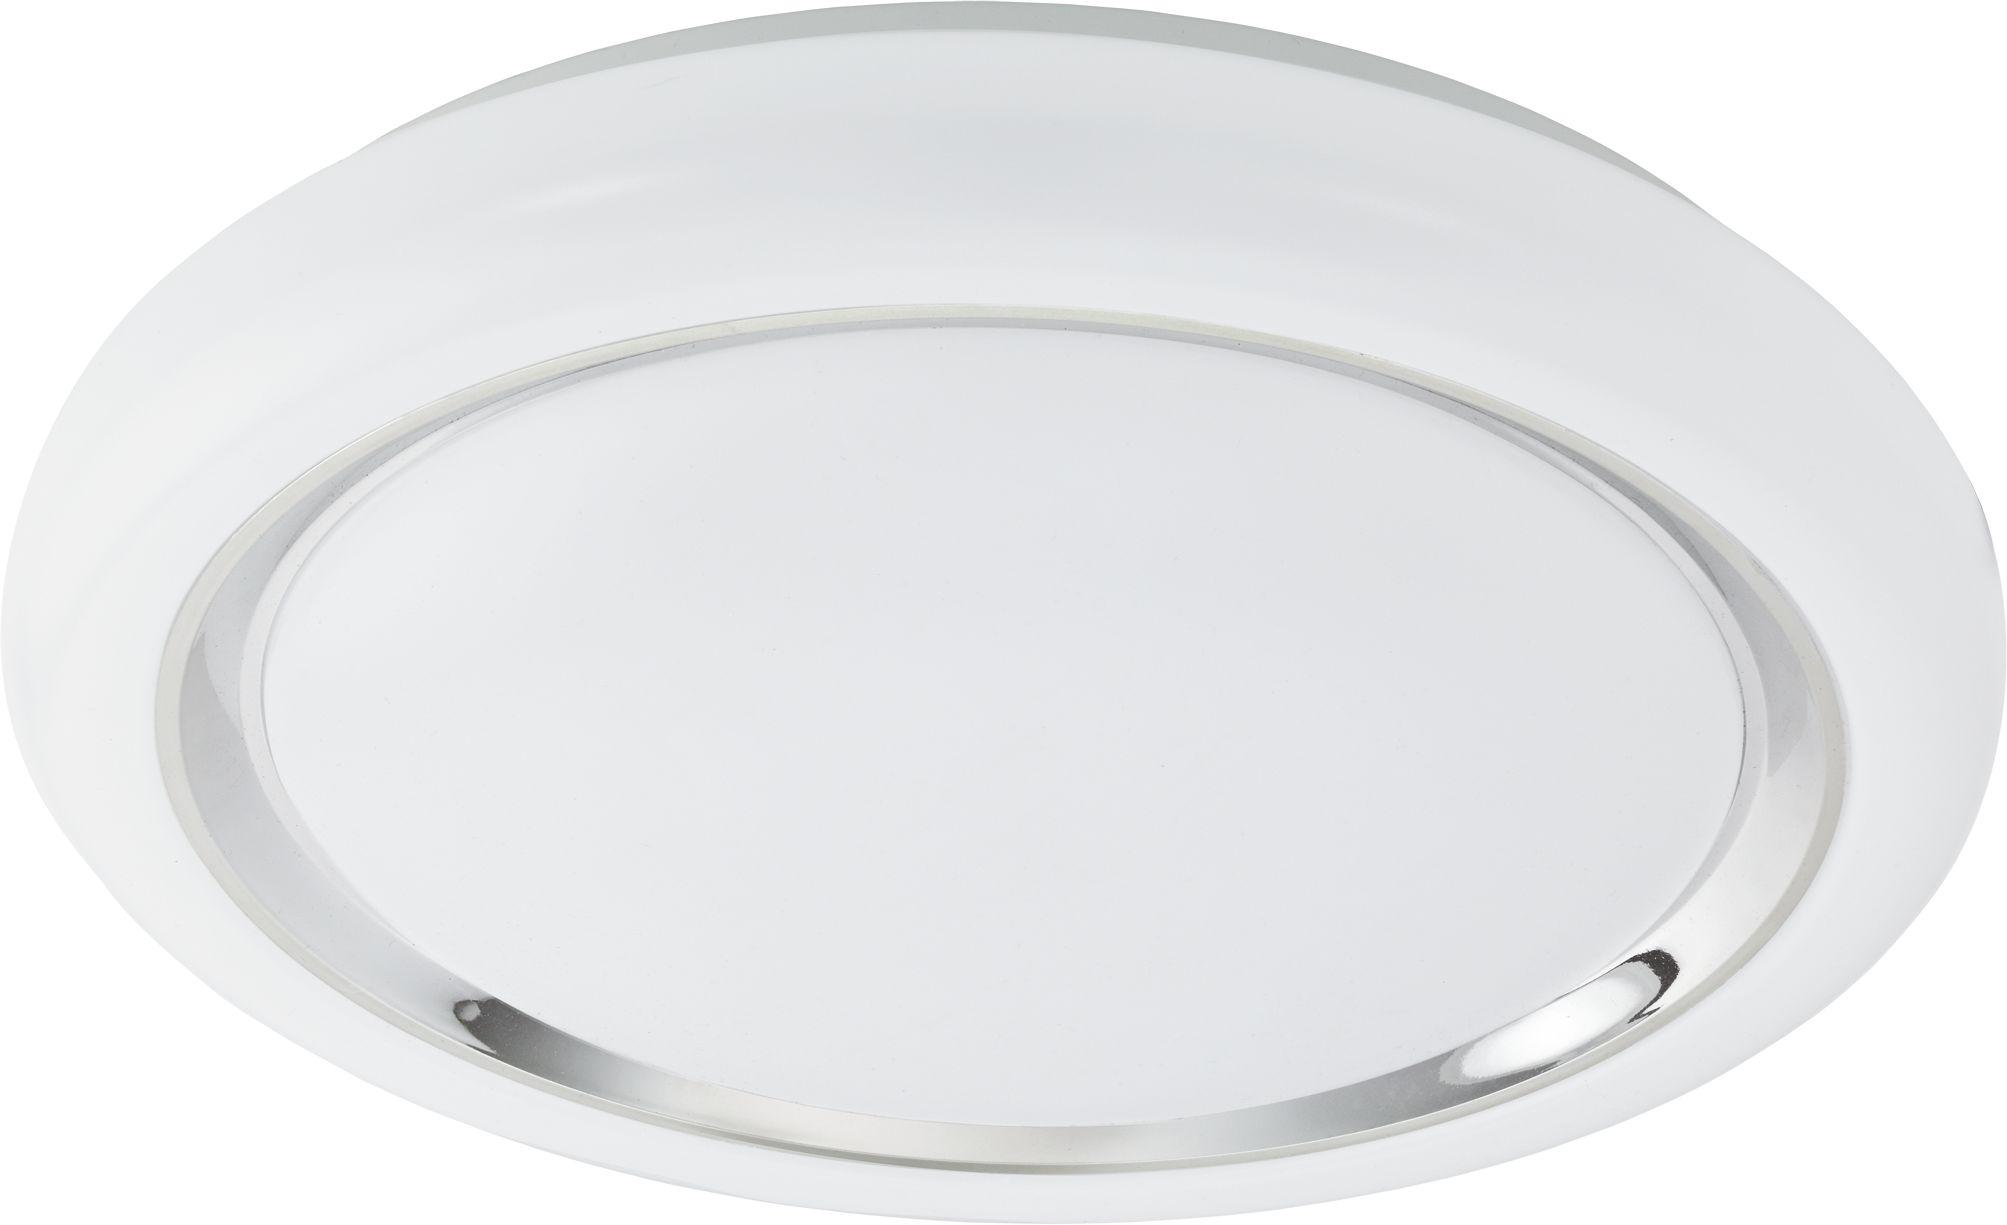 Eglo plafon, lampa sufitowa LED Capasso 96024 - SUPER OFERTA - RABAT w koszyku